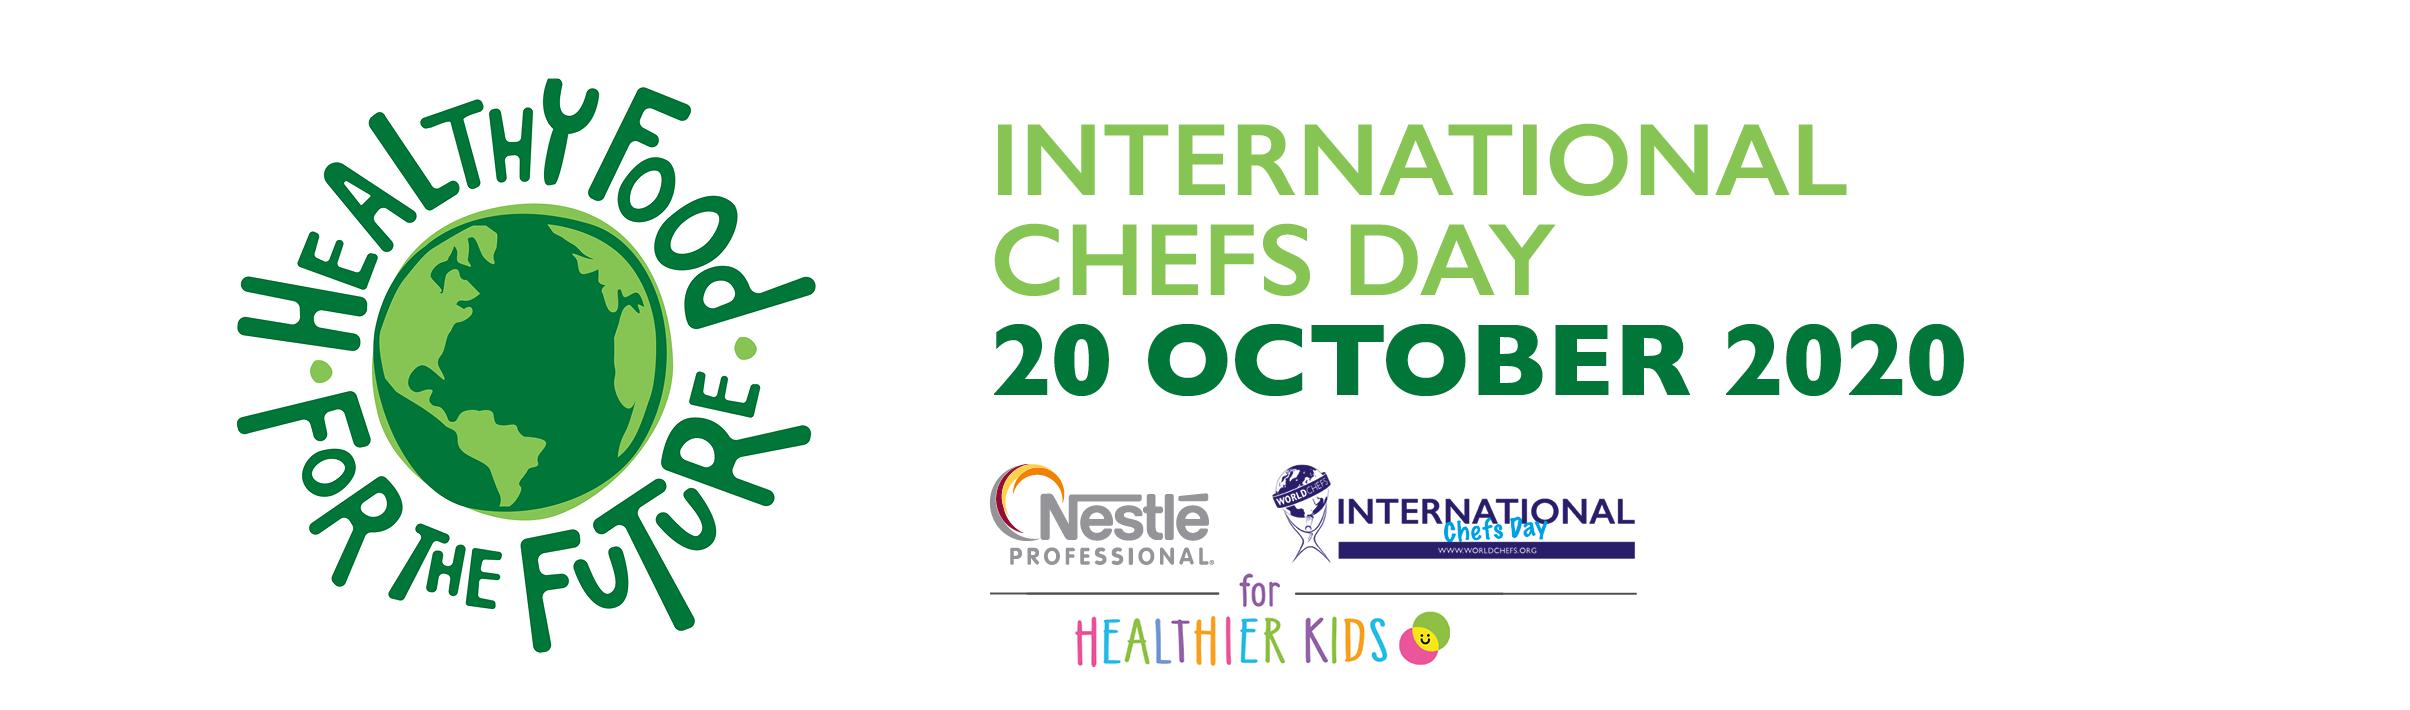 International Chefs Day Theme